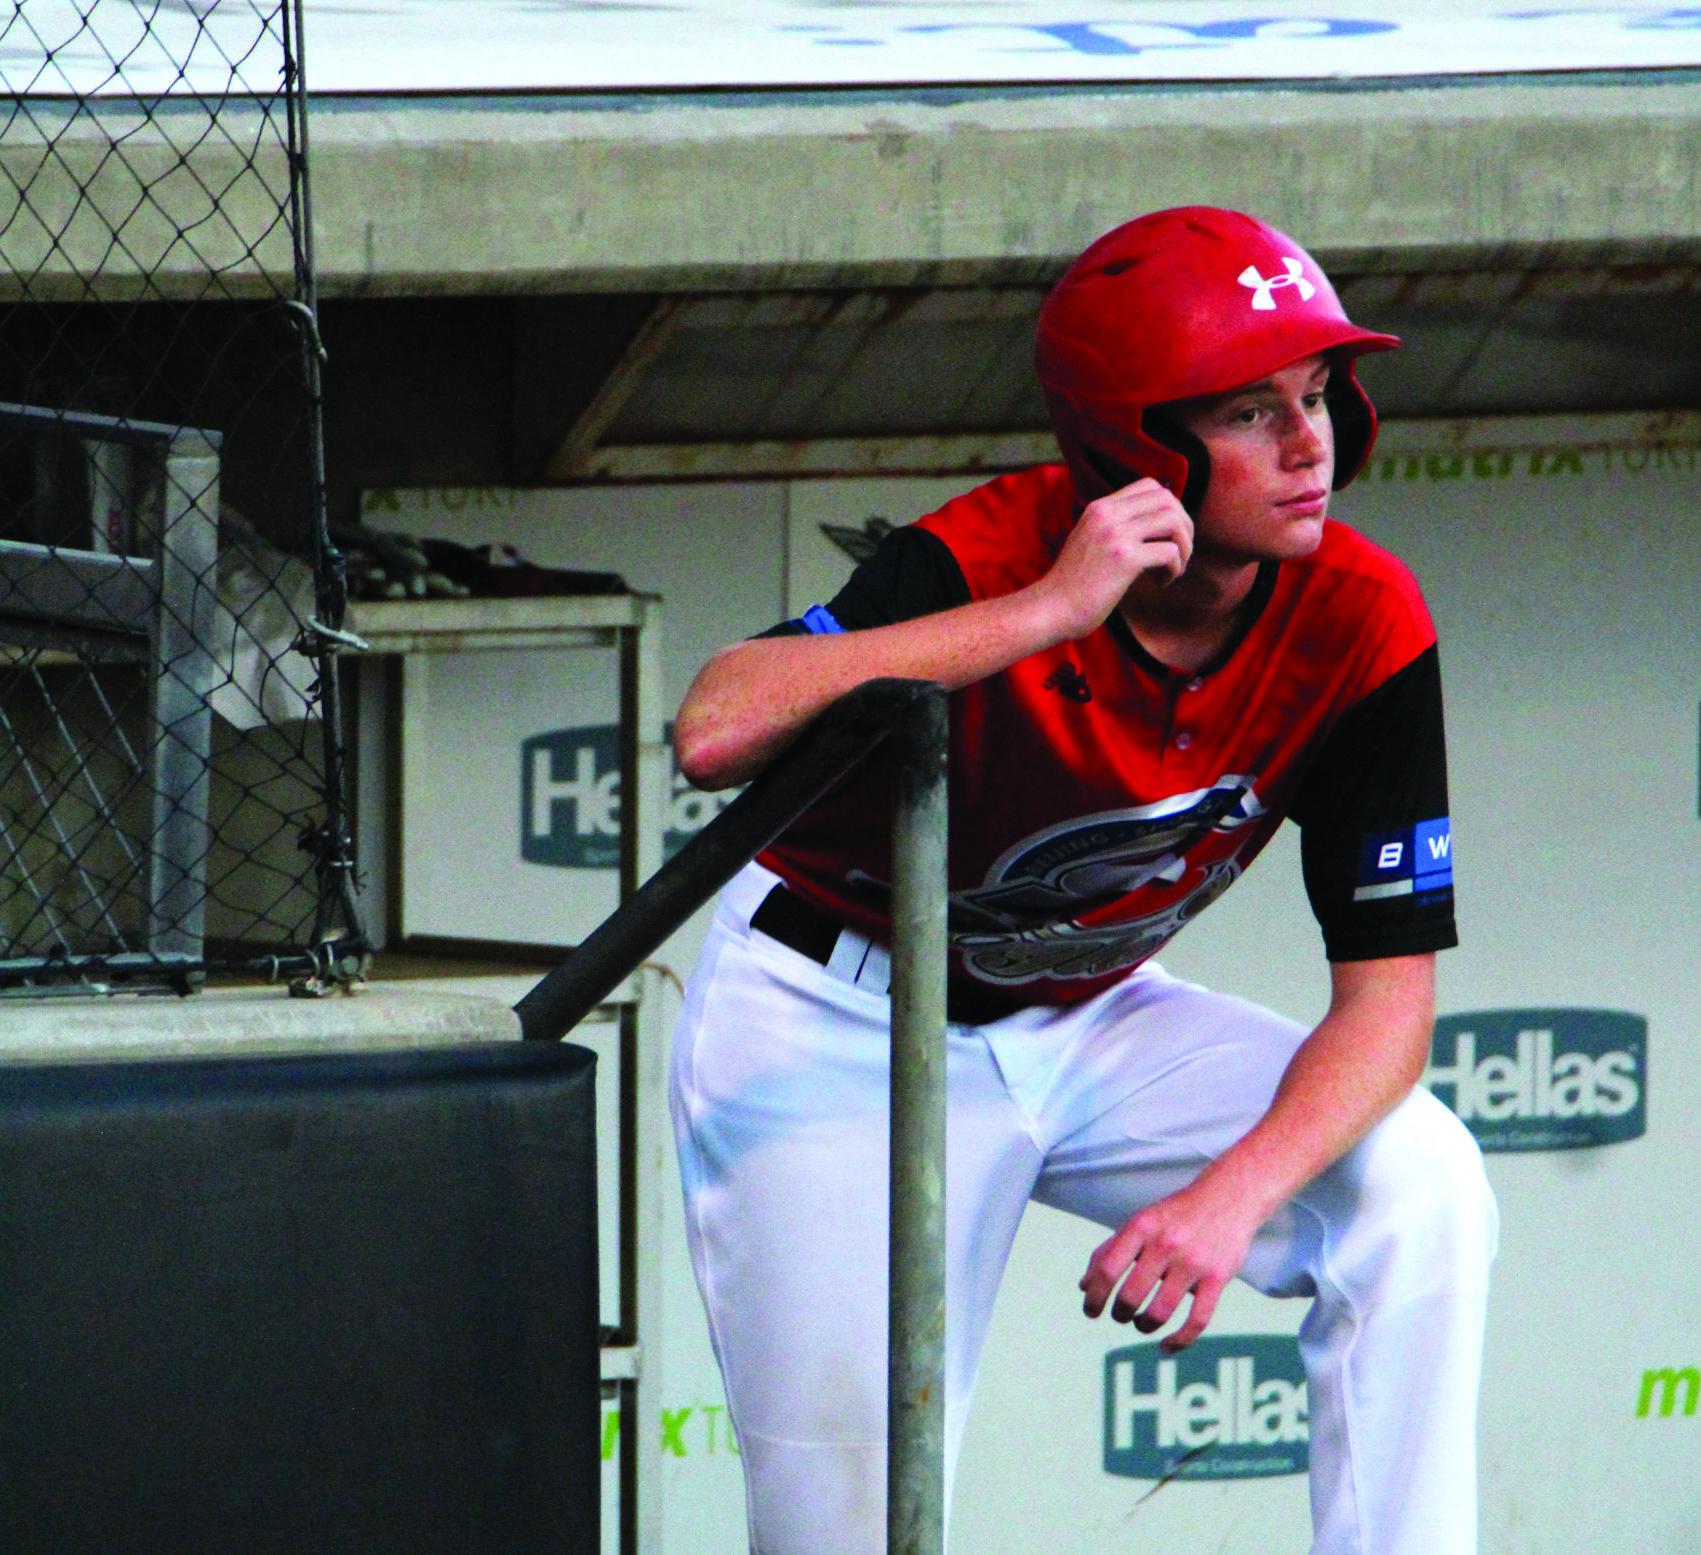 Ball boy at Texas AirHogs baseball game